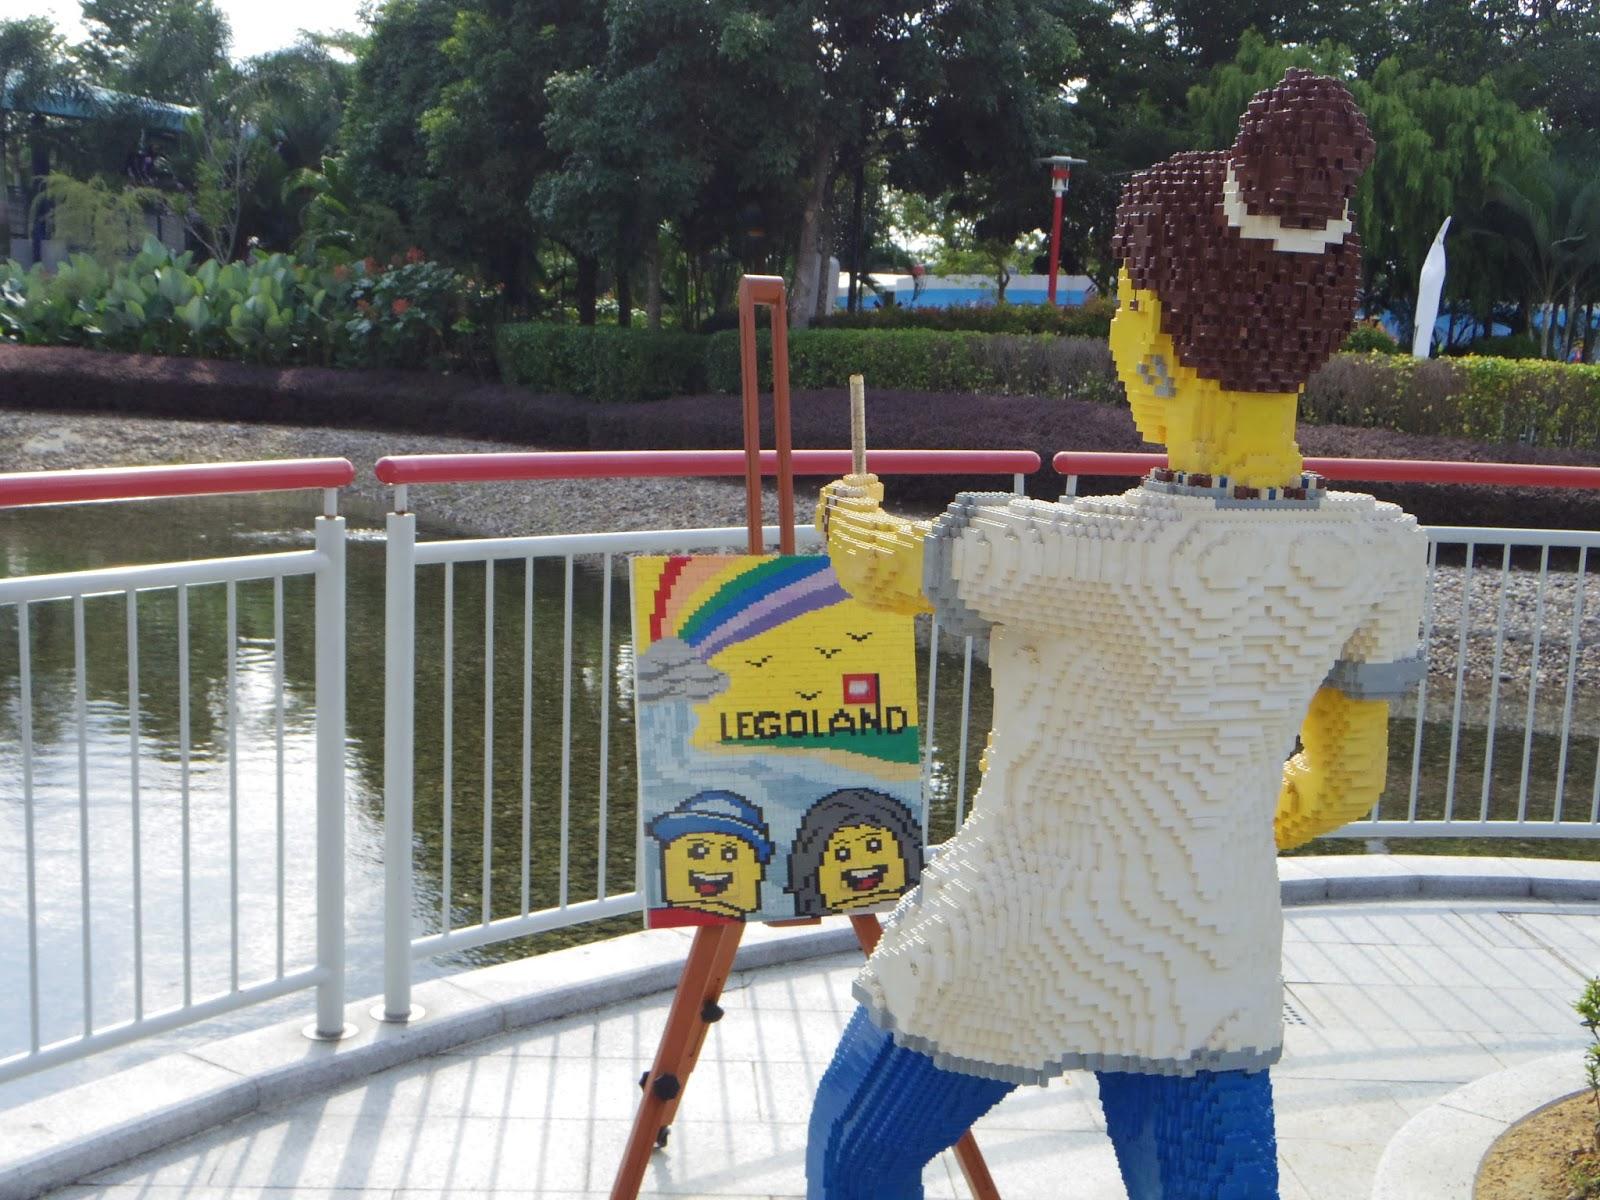 Ke Legoland Malaysia Dari Singapura Travel With Emil Tiket Fisik Garden By The Bay Anak Titip Di Hotel Singapore